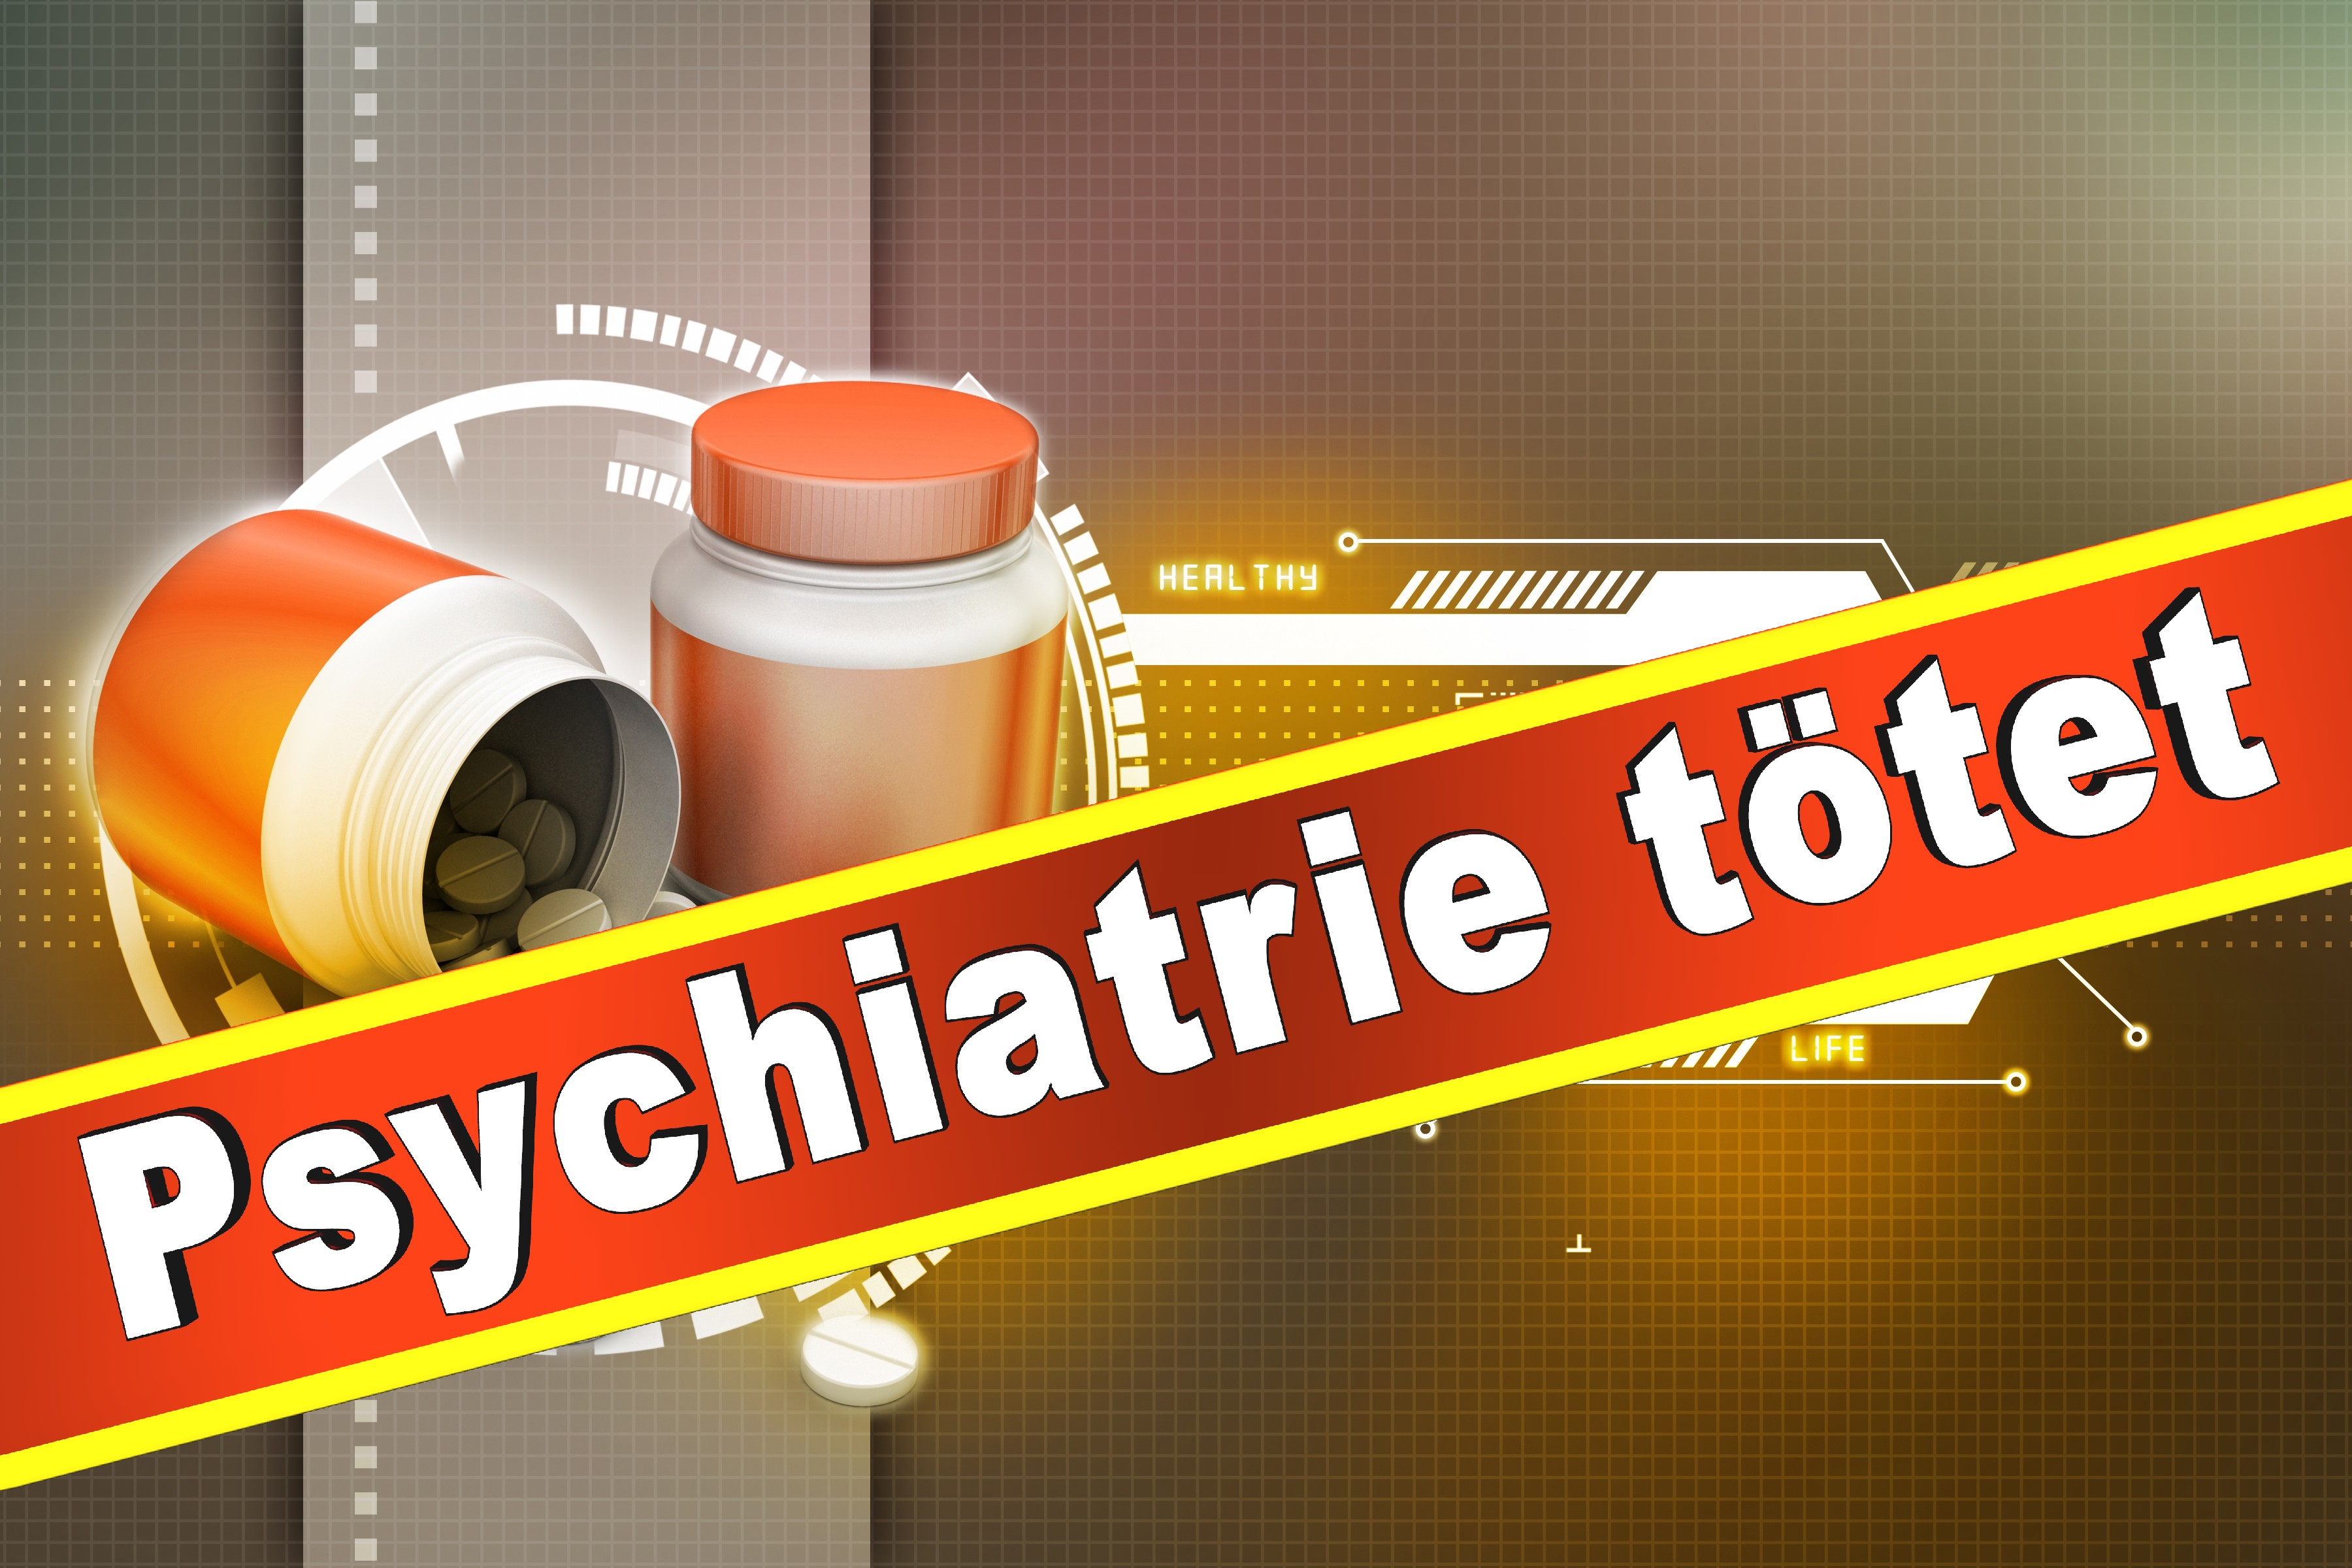 Dr Med Sunhild Wargalla Voss Psychiater Hannover Gutachten Psychiater Facharzt Psychiatrie